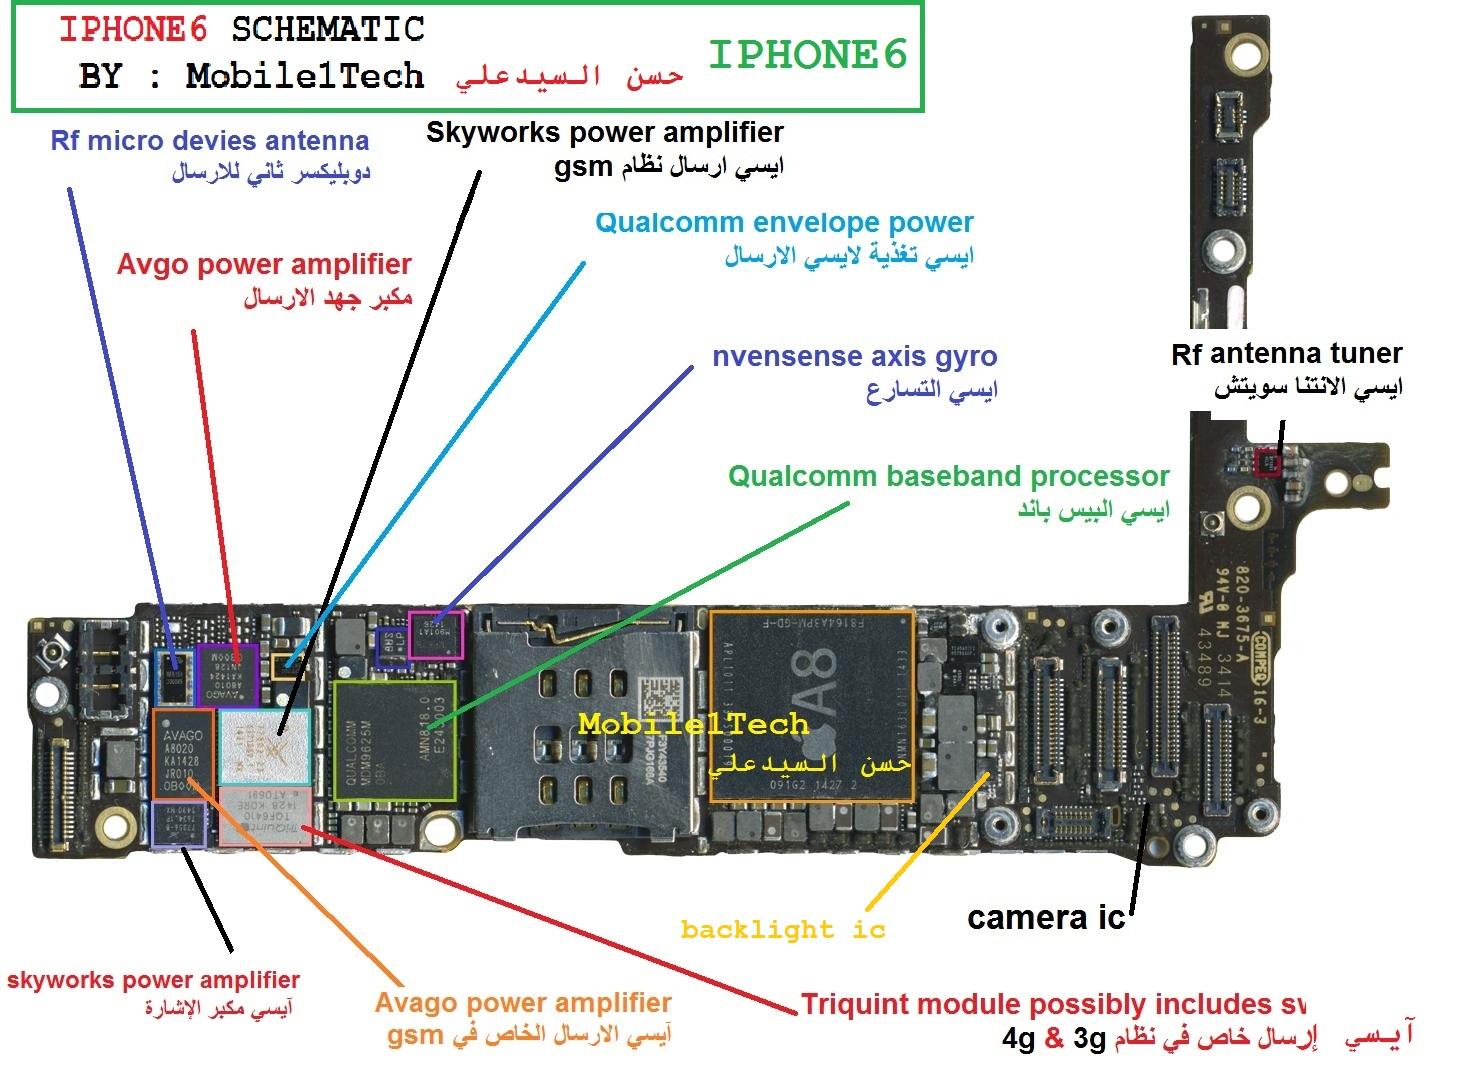 Mobile1Tech حسن السيدعلي: IPHONE 6 SCHEMATIC